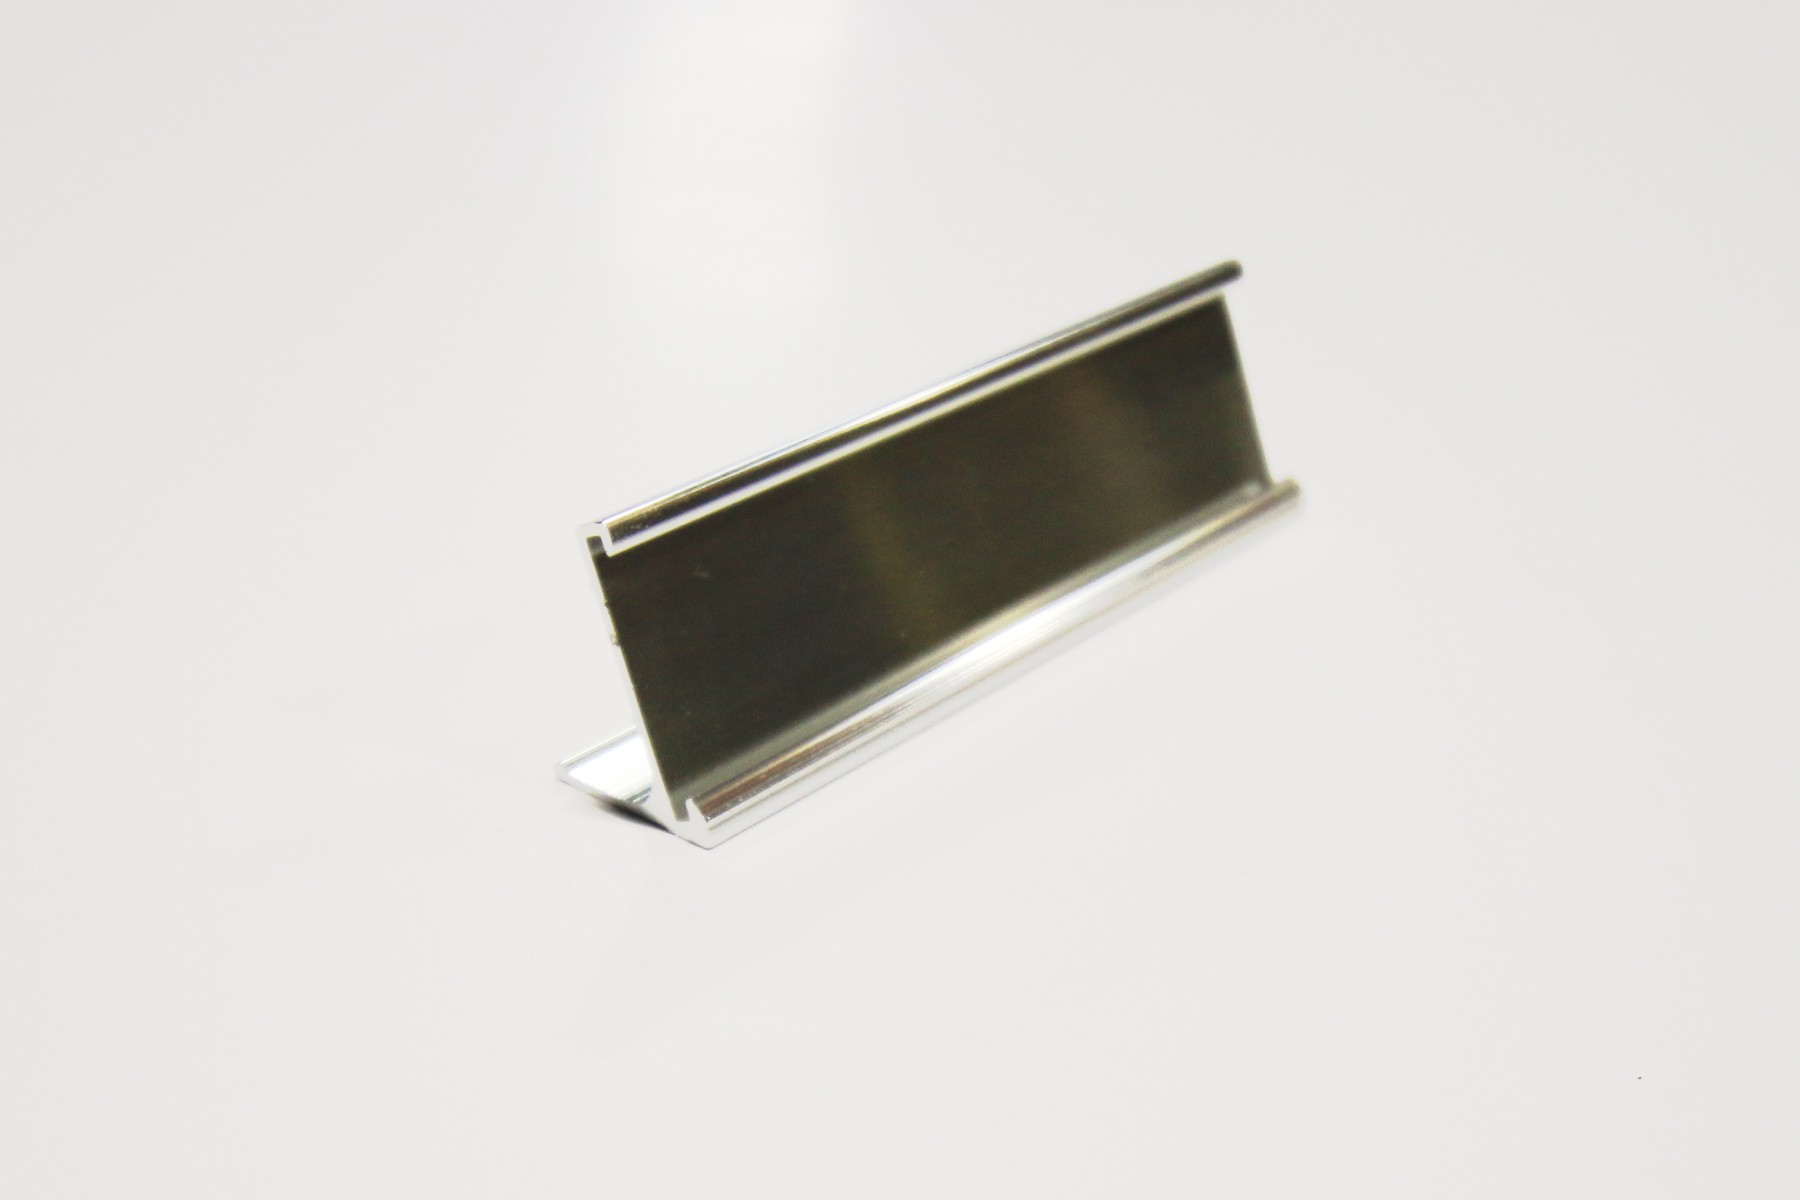 1 x 6 Desk Holder, Silver